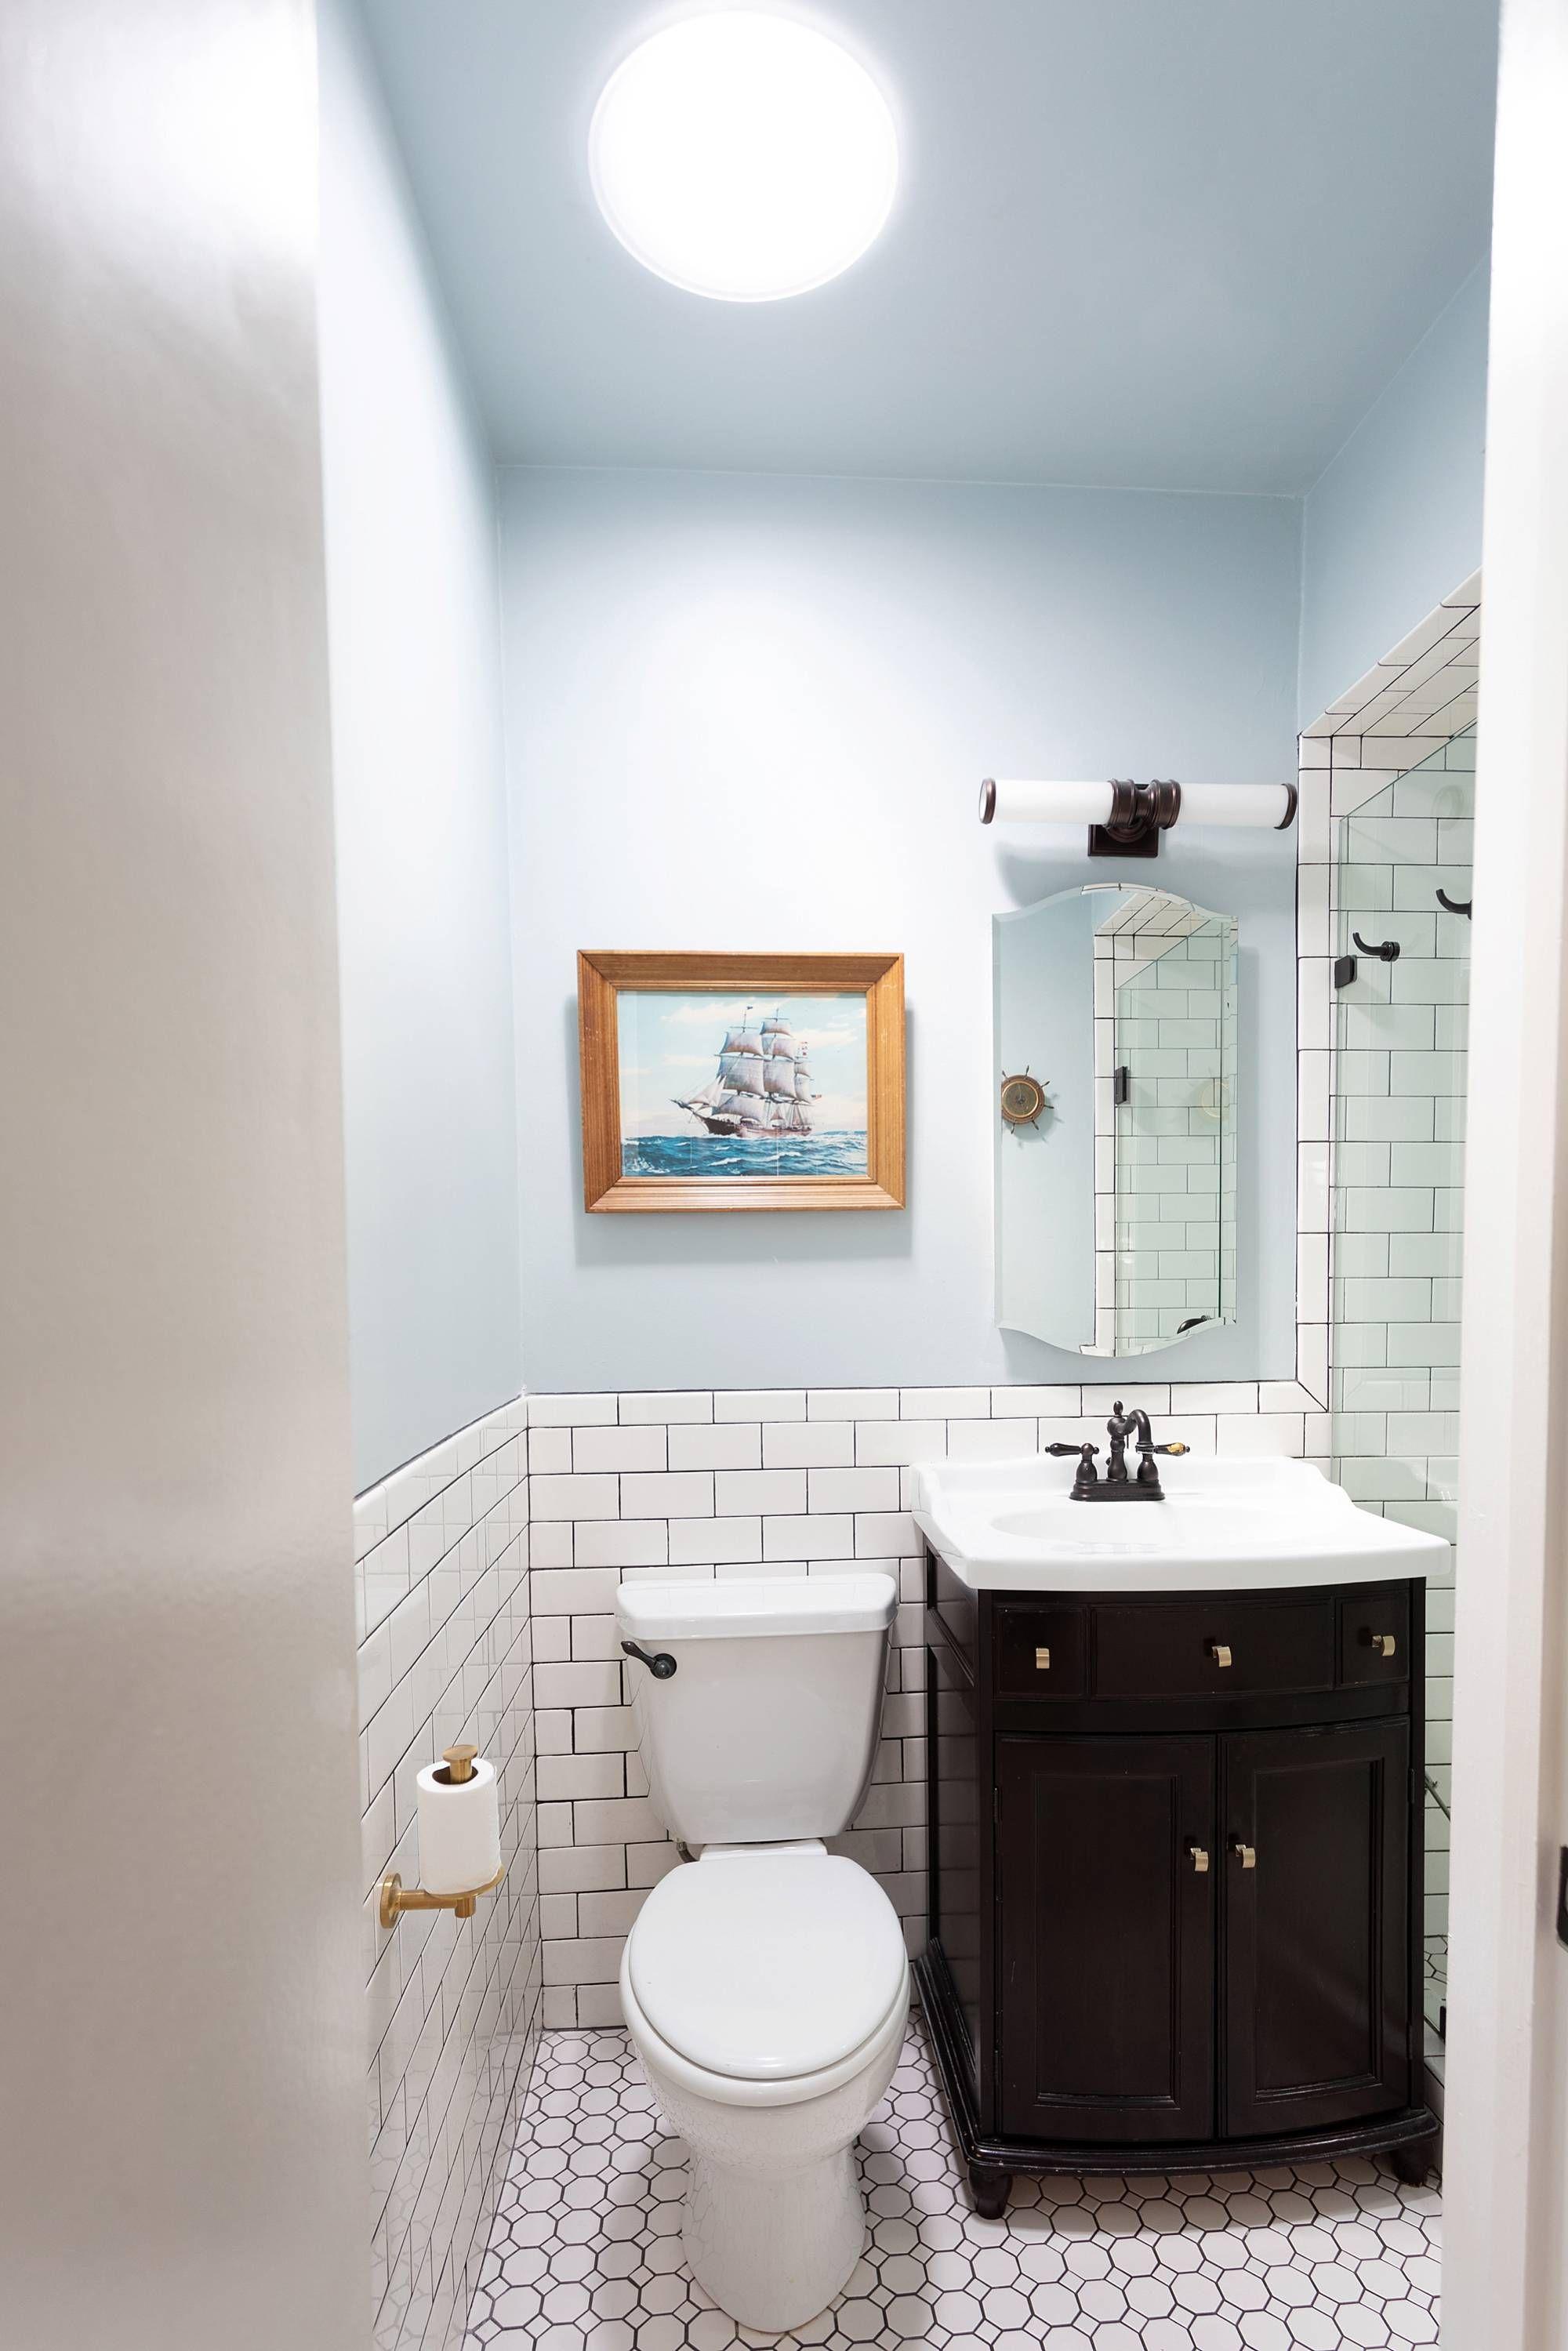 14 Plants For Windowless Bathroom Bathroom Plants Decor Best Bathroom Plants Plants